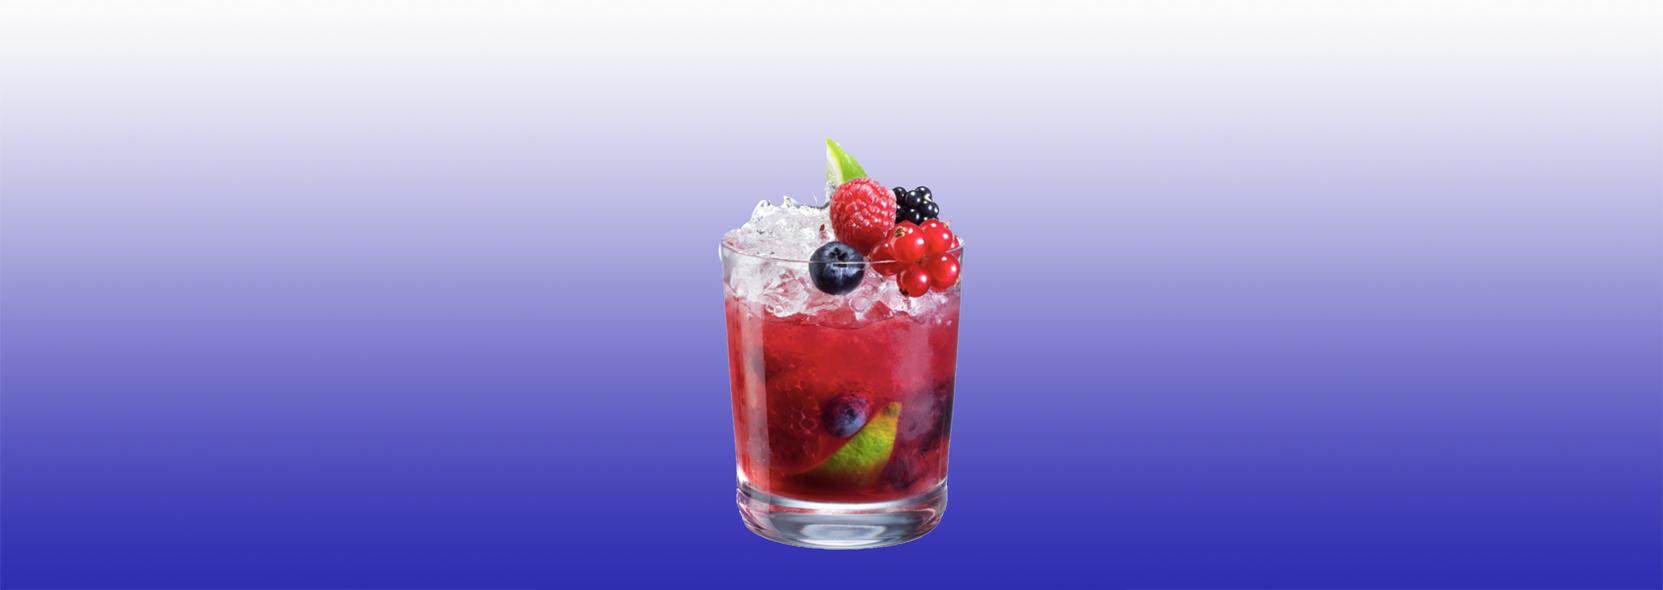 Finlandia Super Berry Roska